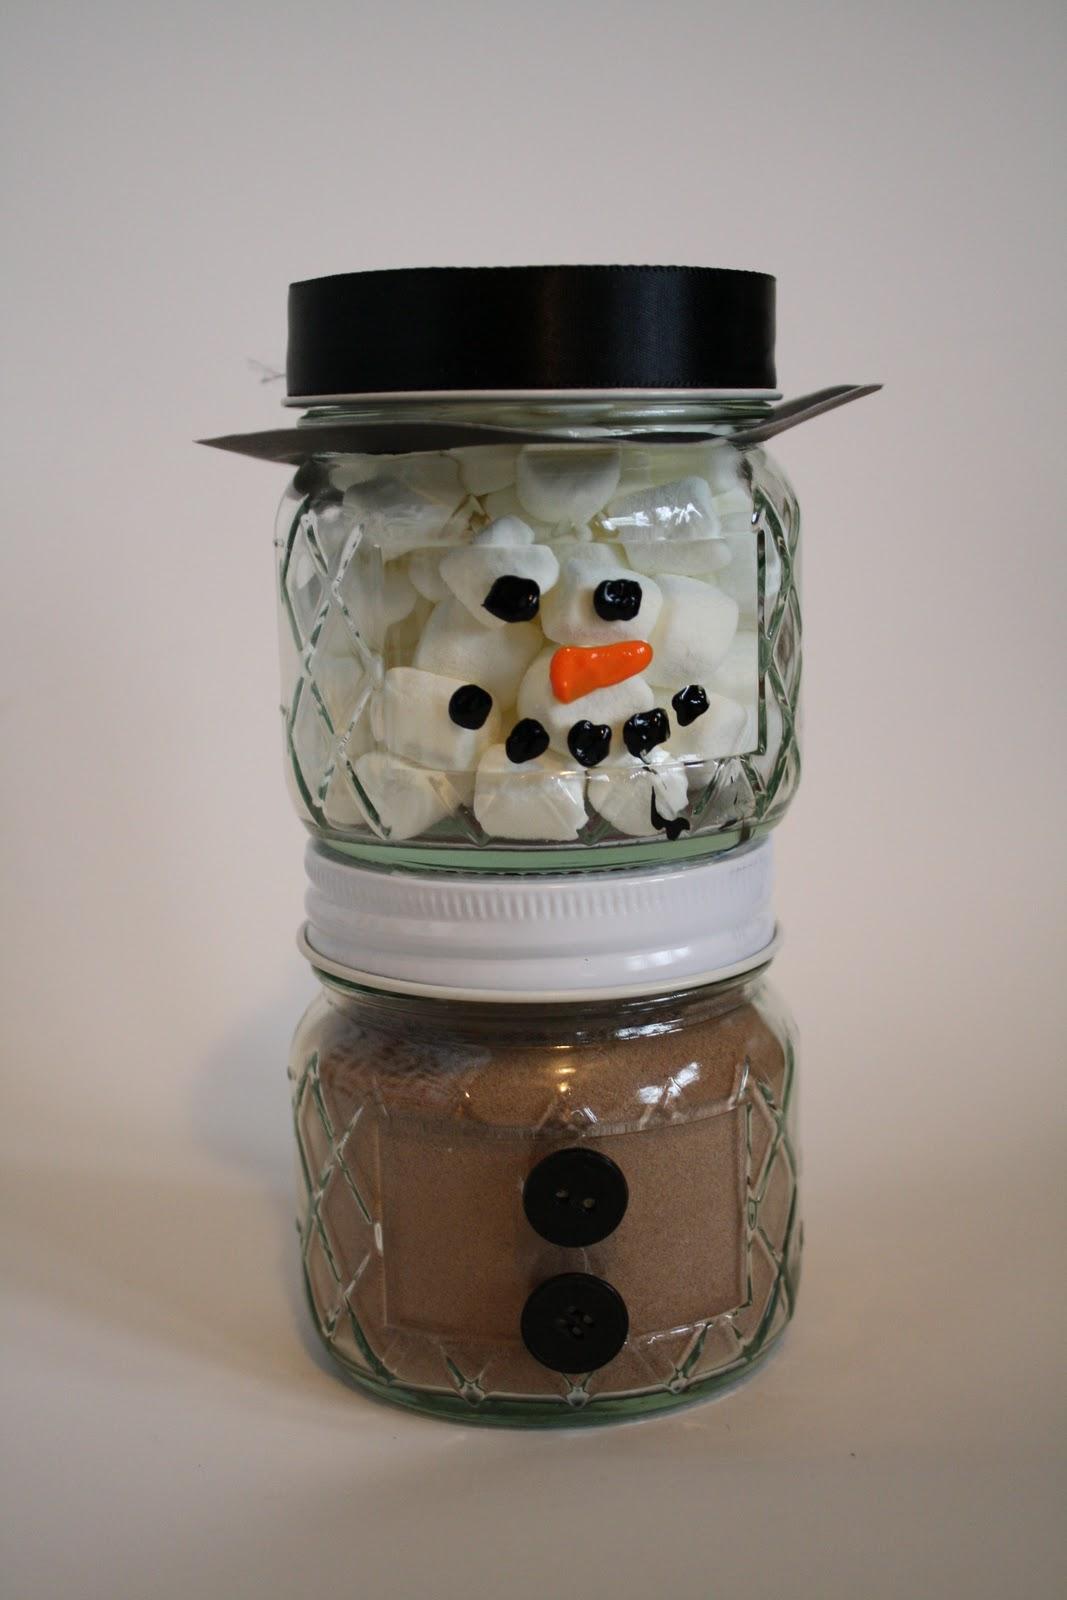 Easy Diy Holiday T Hot Chocolate Jar Idea